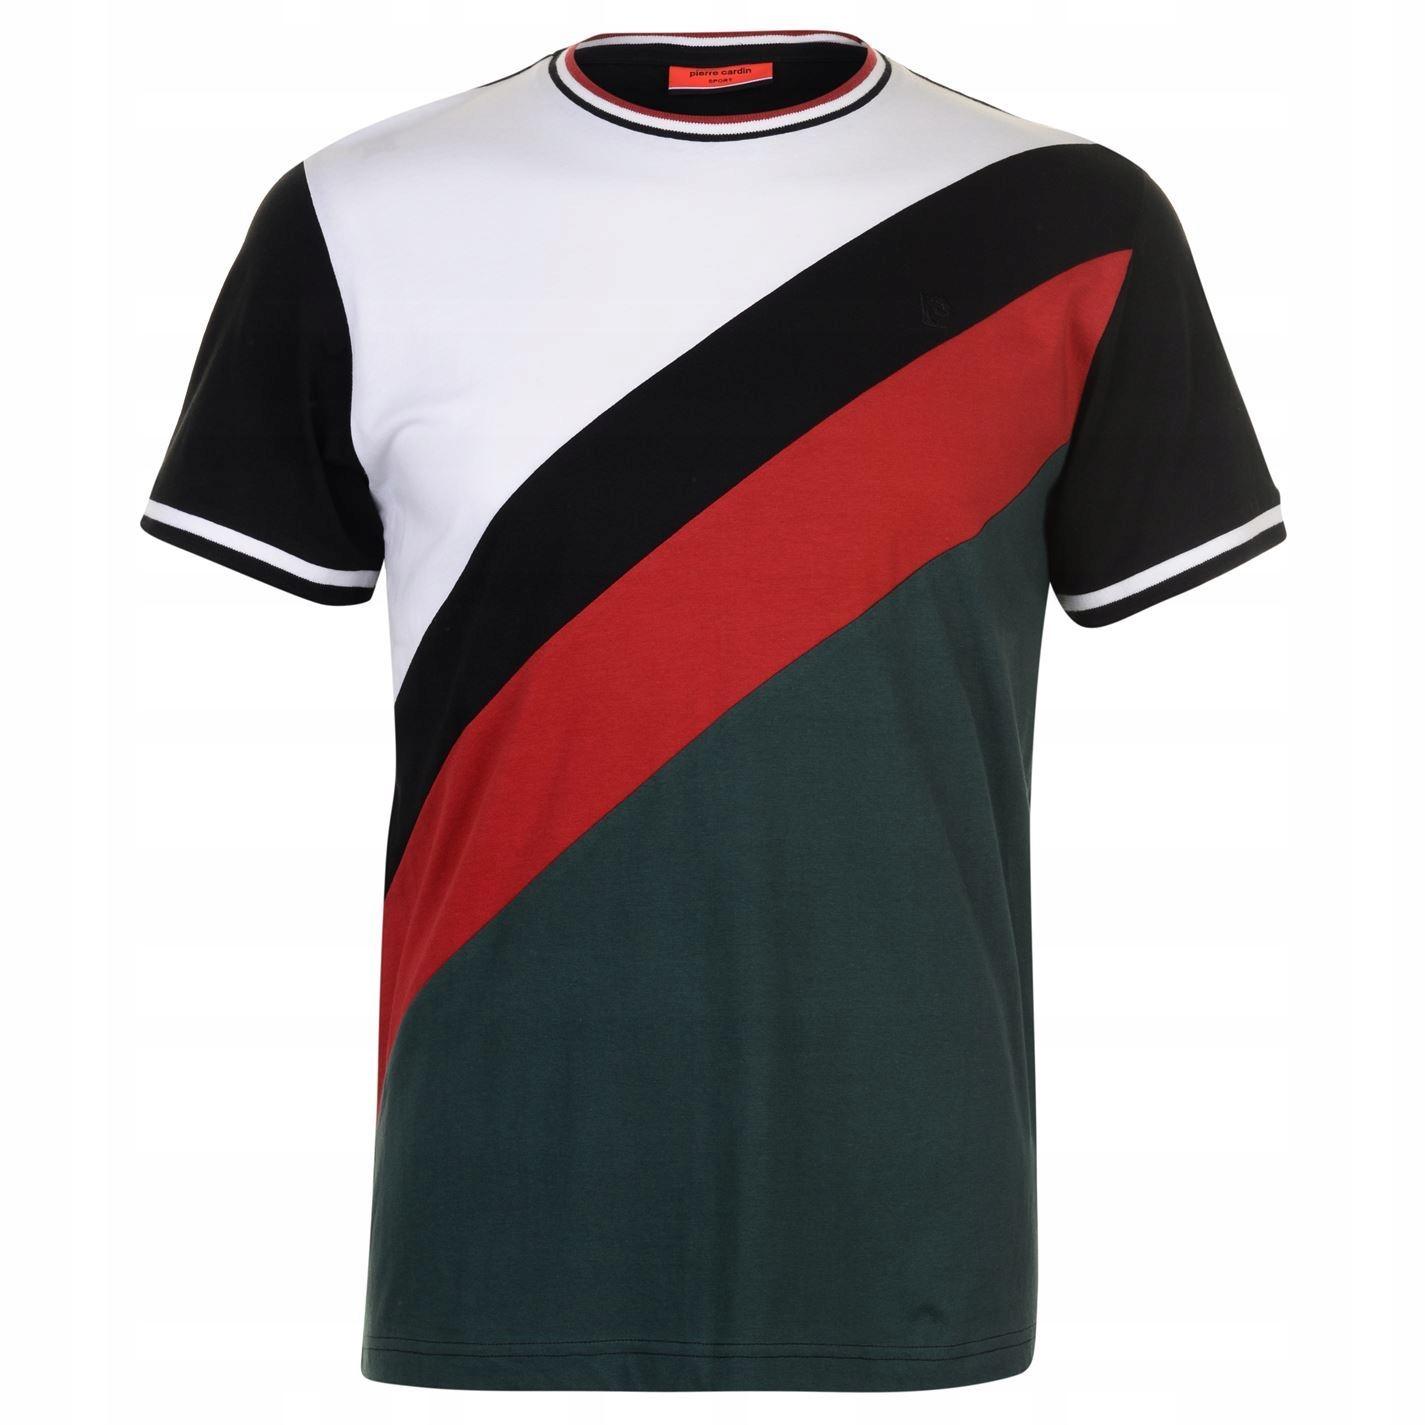 E2179 PIERRE CARDIN koszulka T-SHIRT męski L